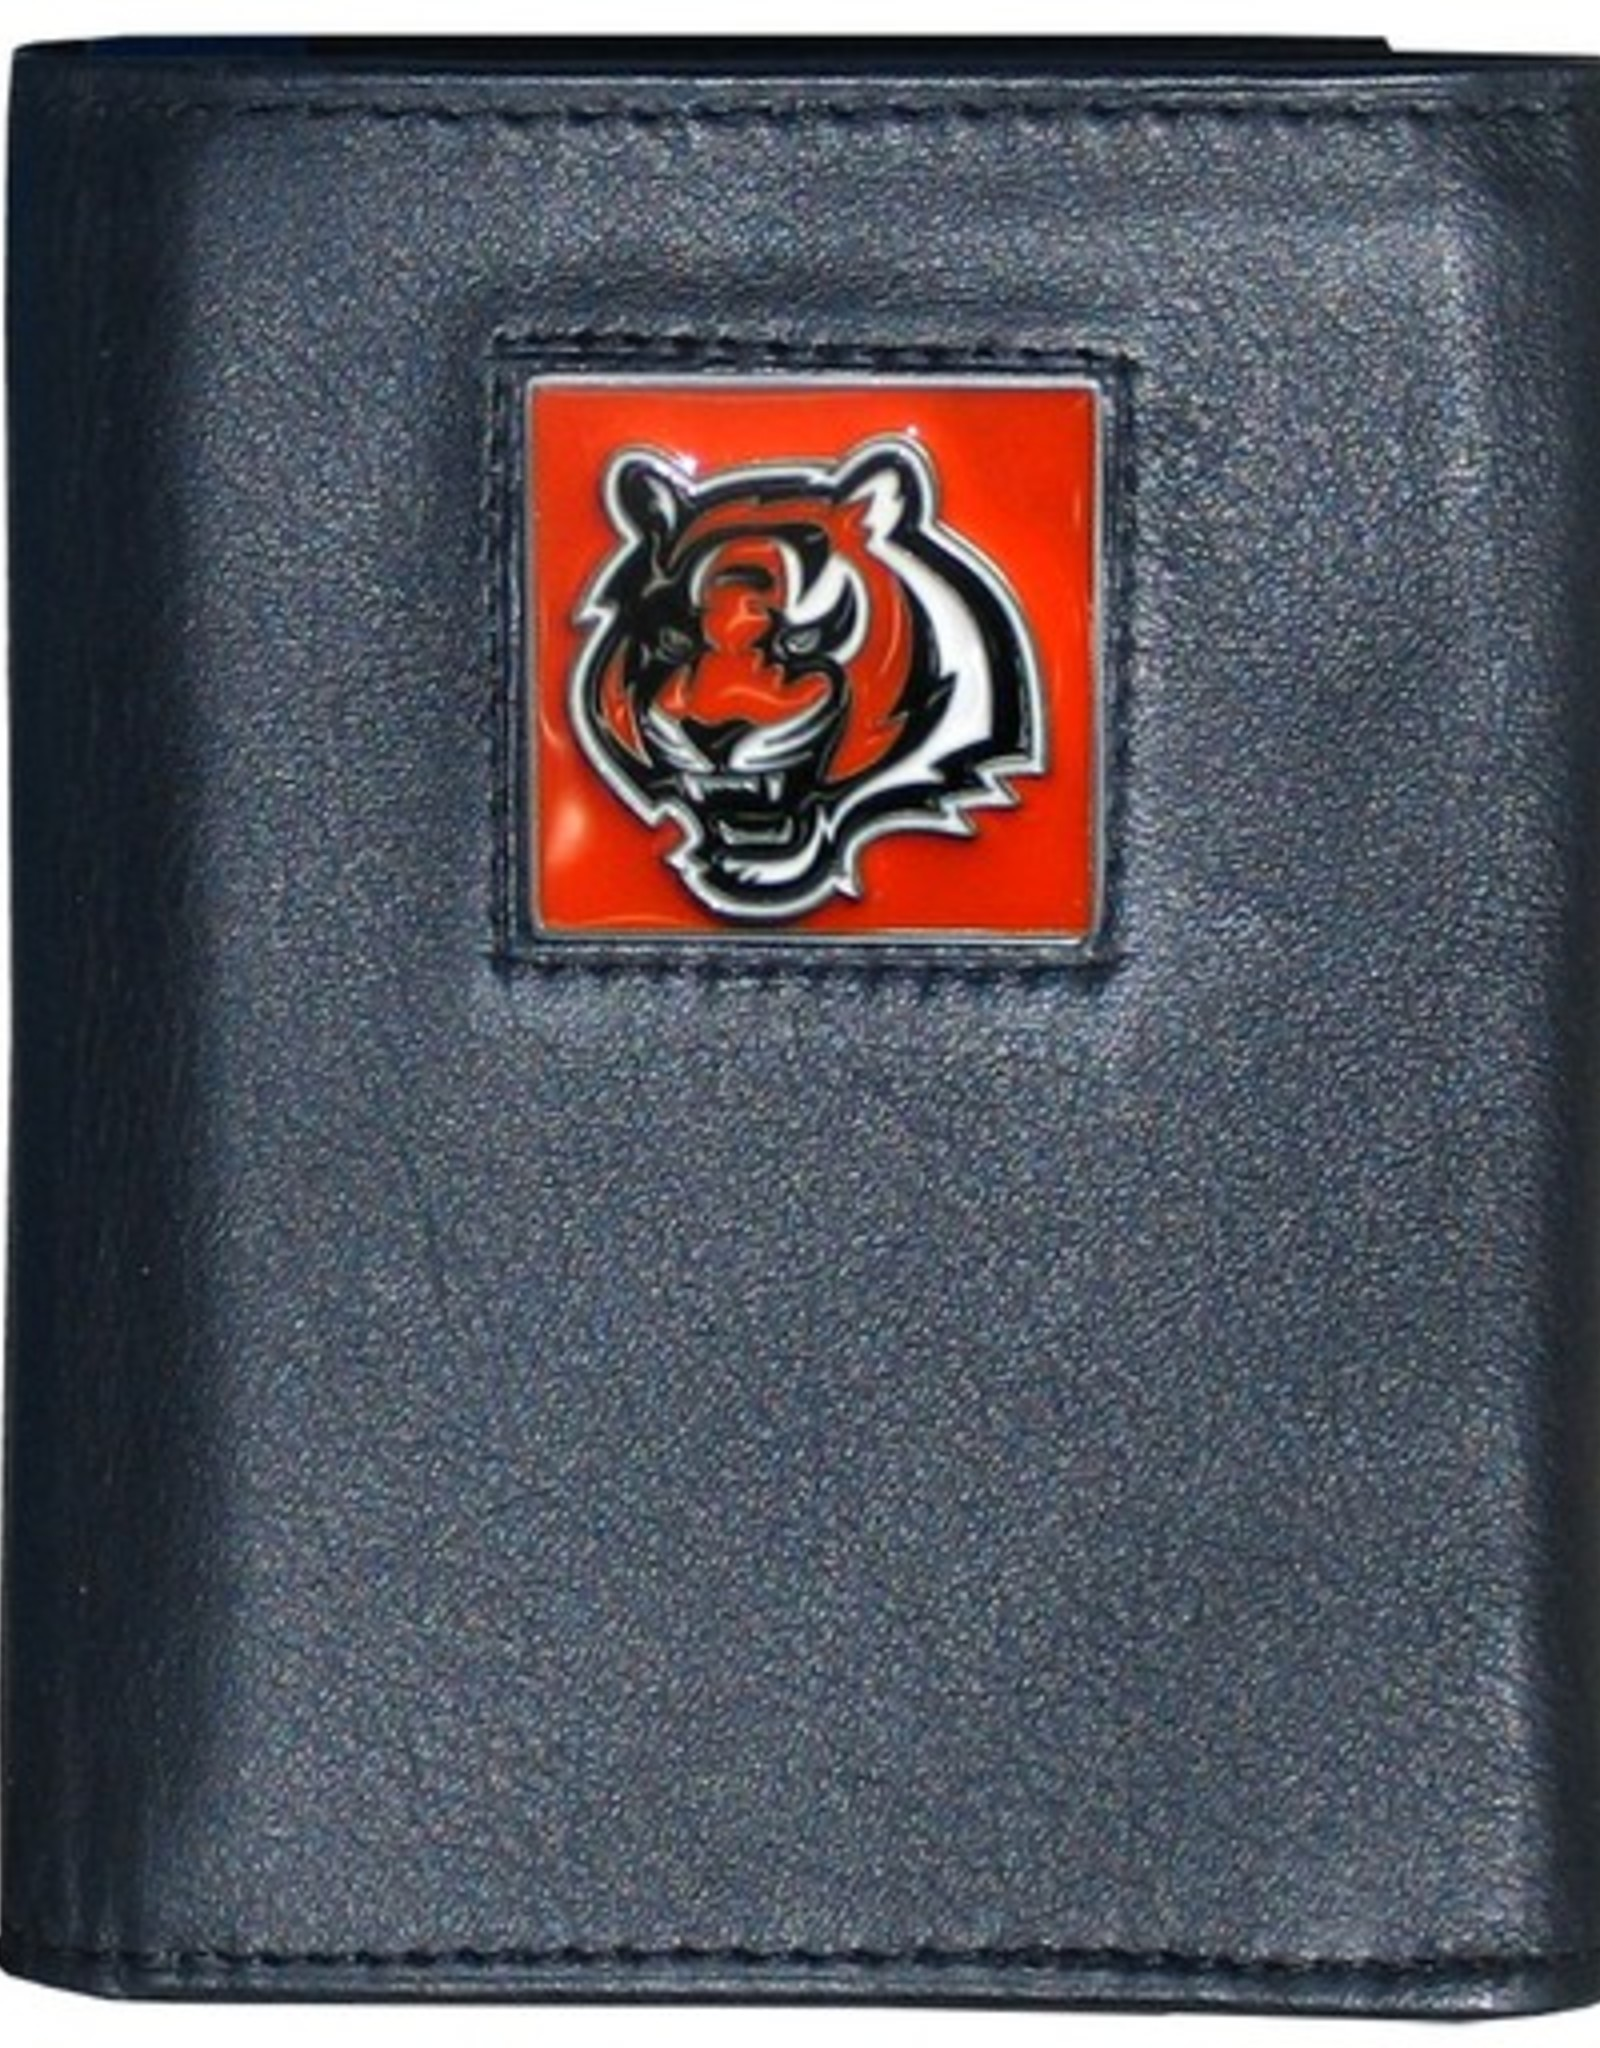 SISKIYOU GIFTS Cincinnati Bengals Executive Black Leather Trifold Wallet